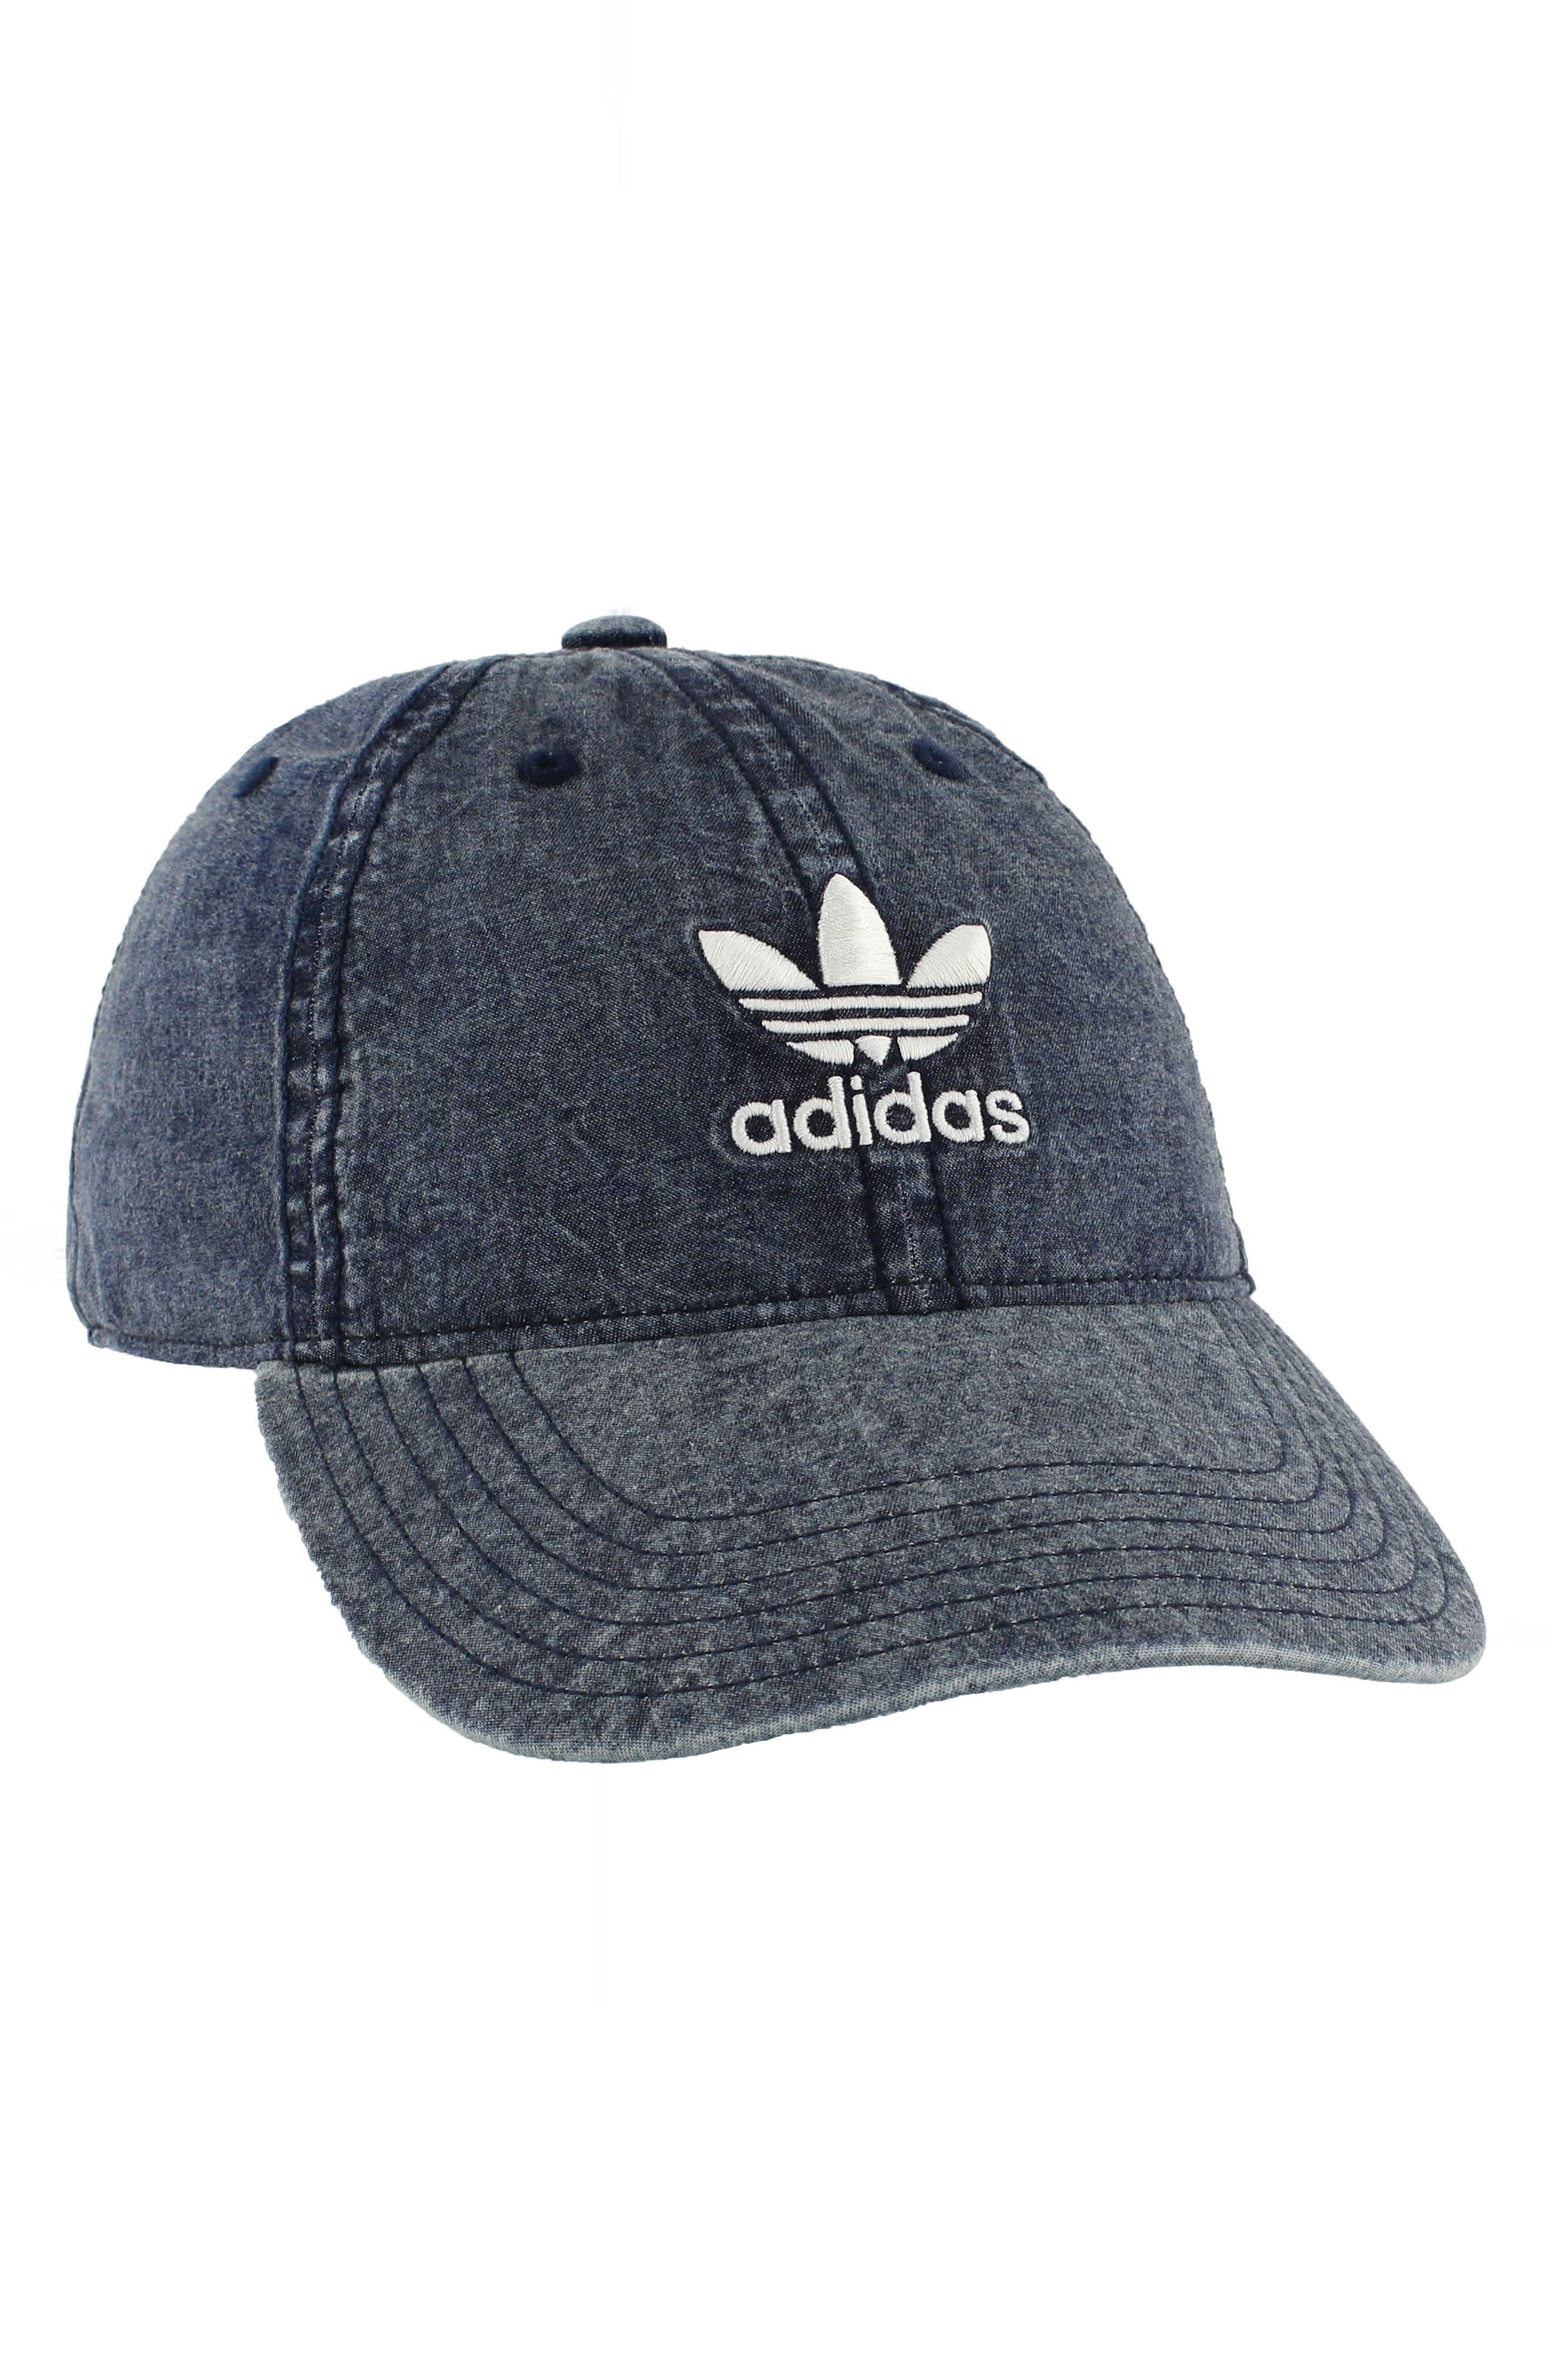 adidas Originals Relaxed Strap-Back Cap